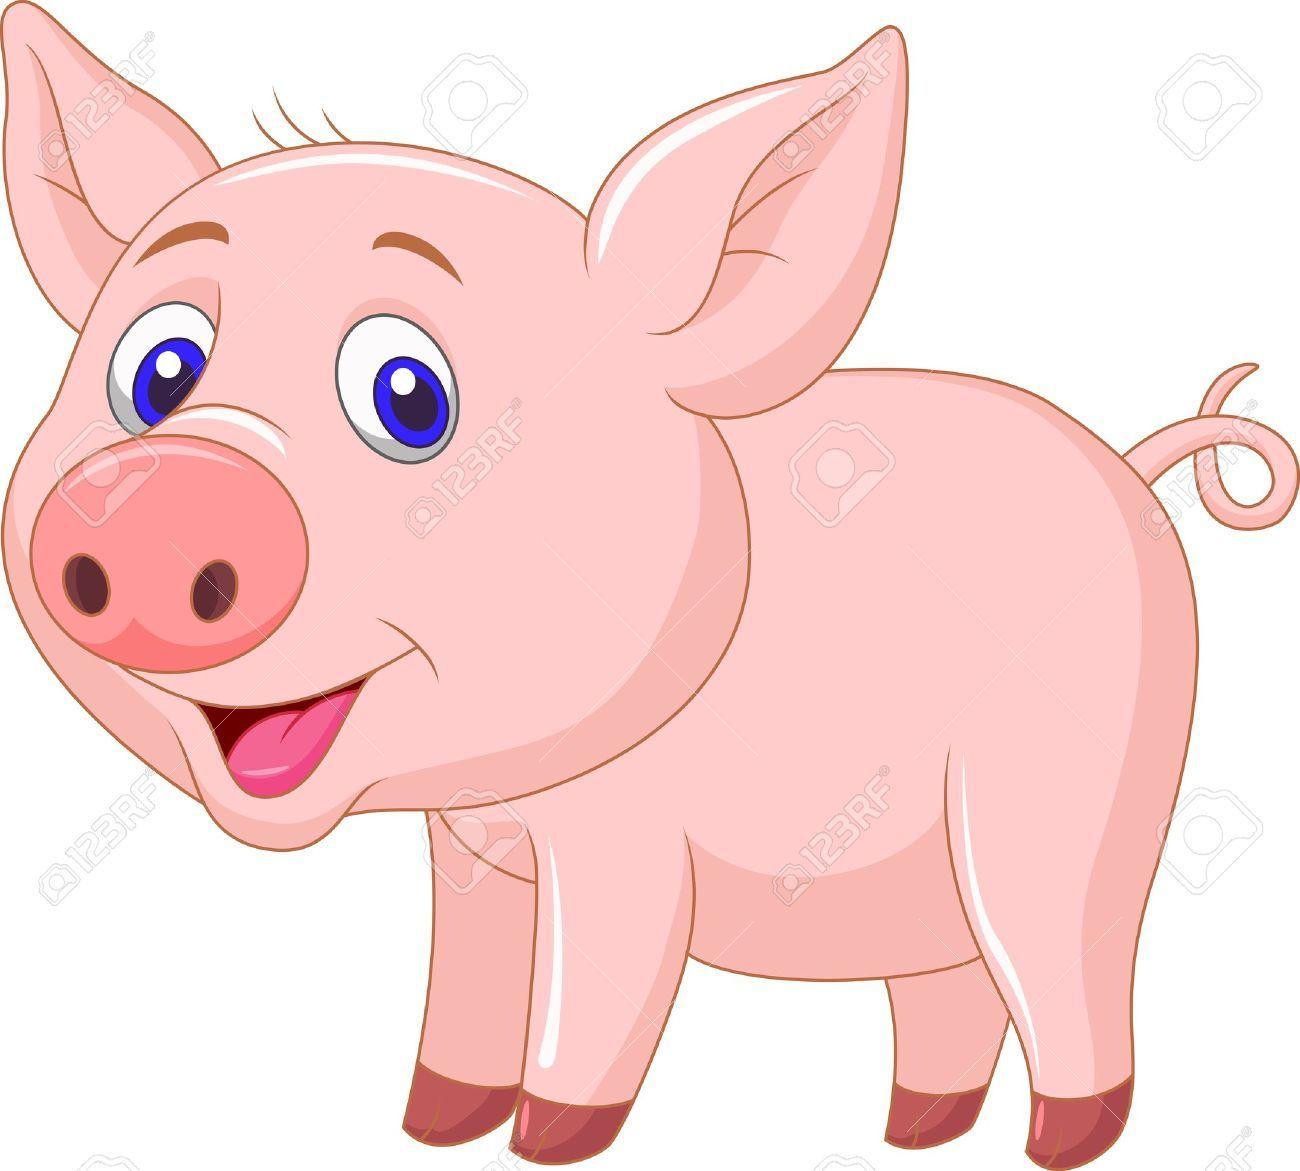 Animal clipart cerdo image freeuse download Cerdo clipart 3 » Clipart Portal image freeuse download